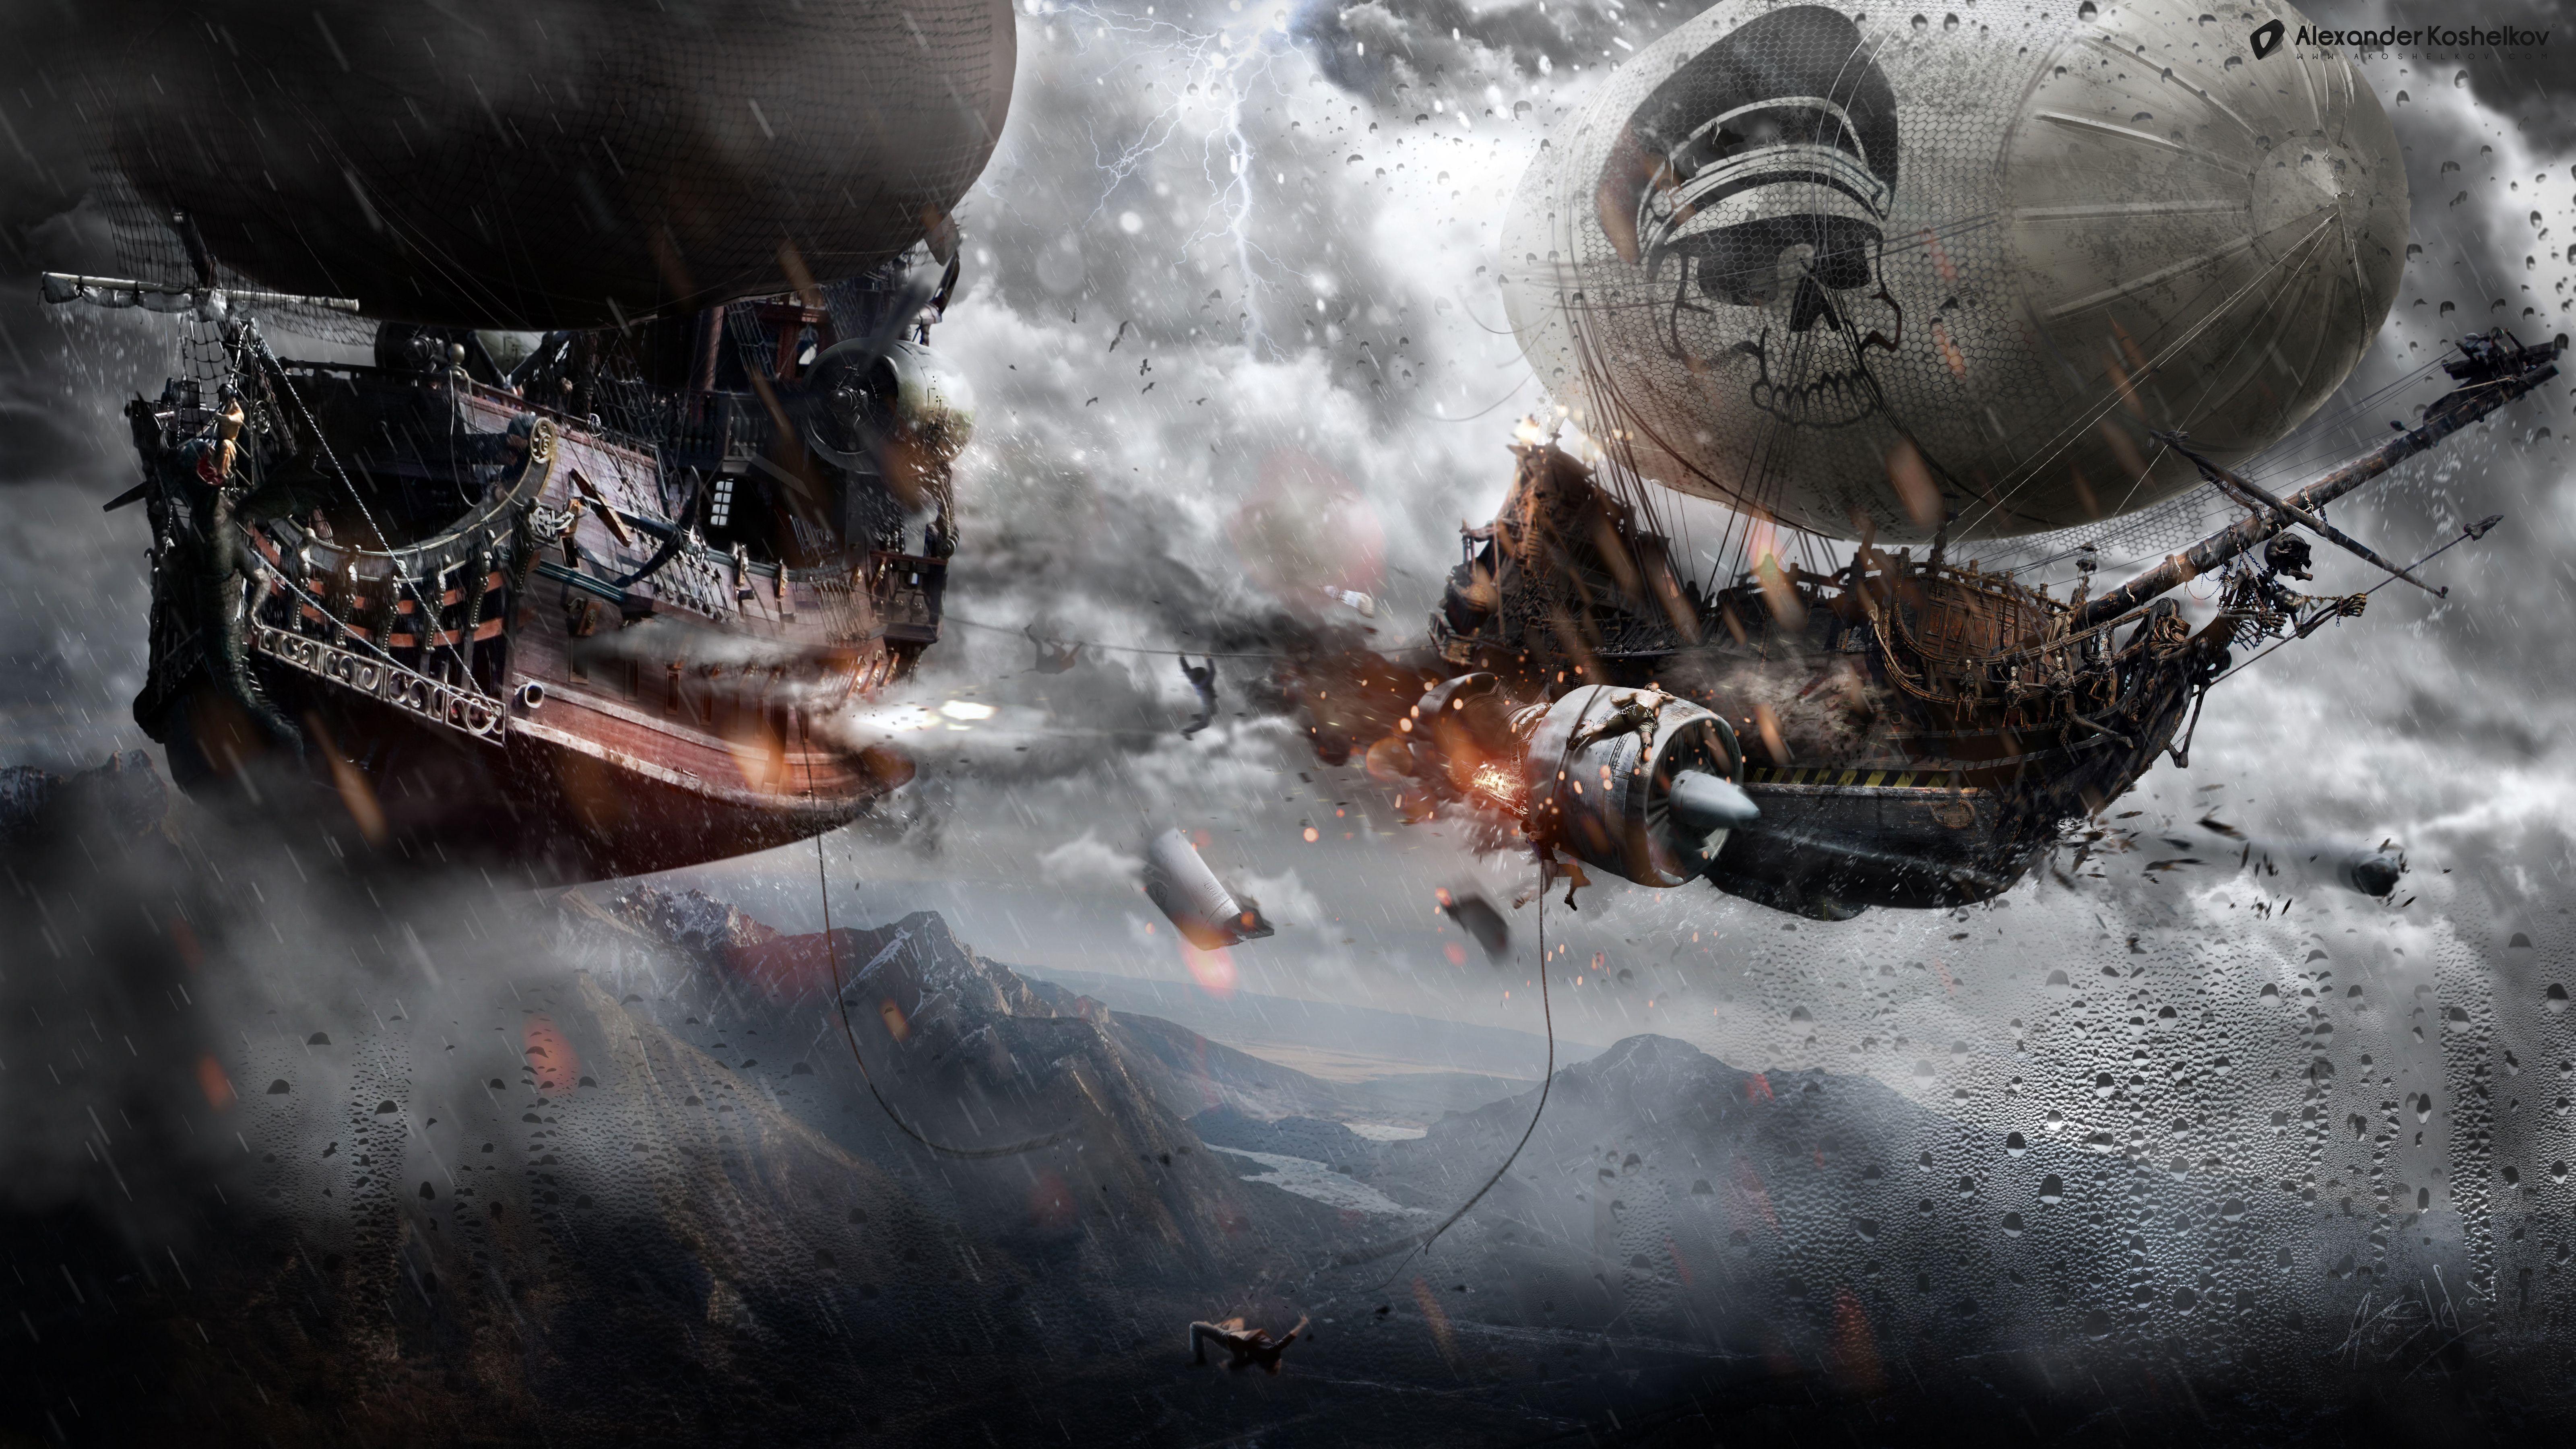 General 6400x3600 artwork fantasy art digital art steampunk ship battle sky pirates airships Alexander Koshelkov